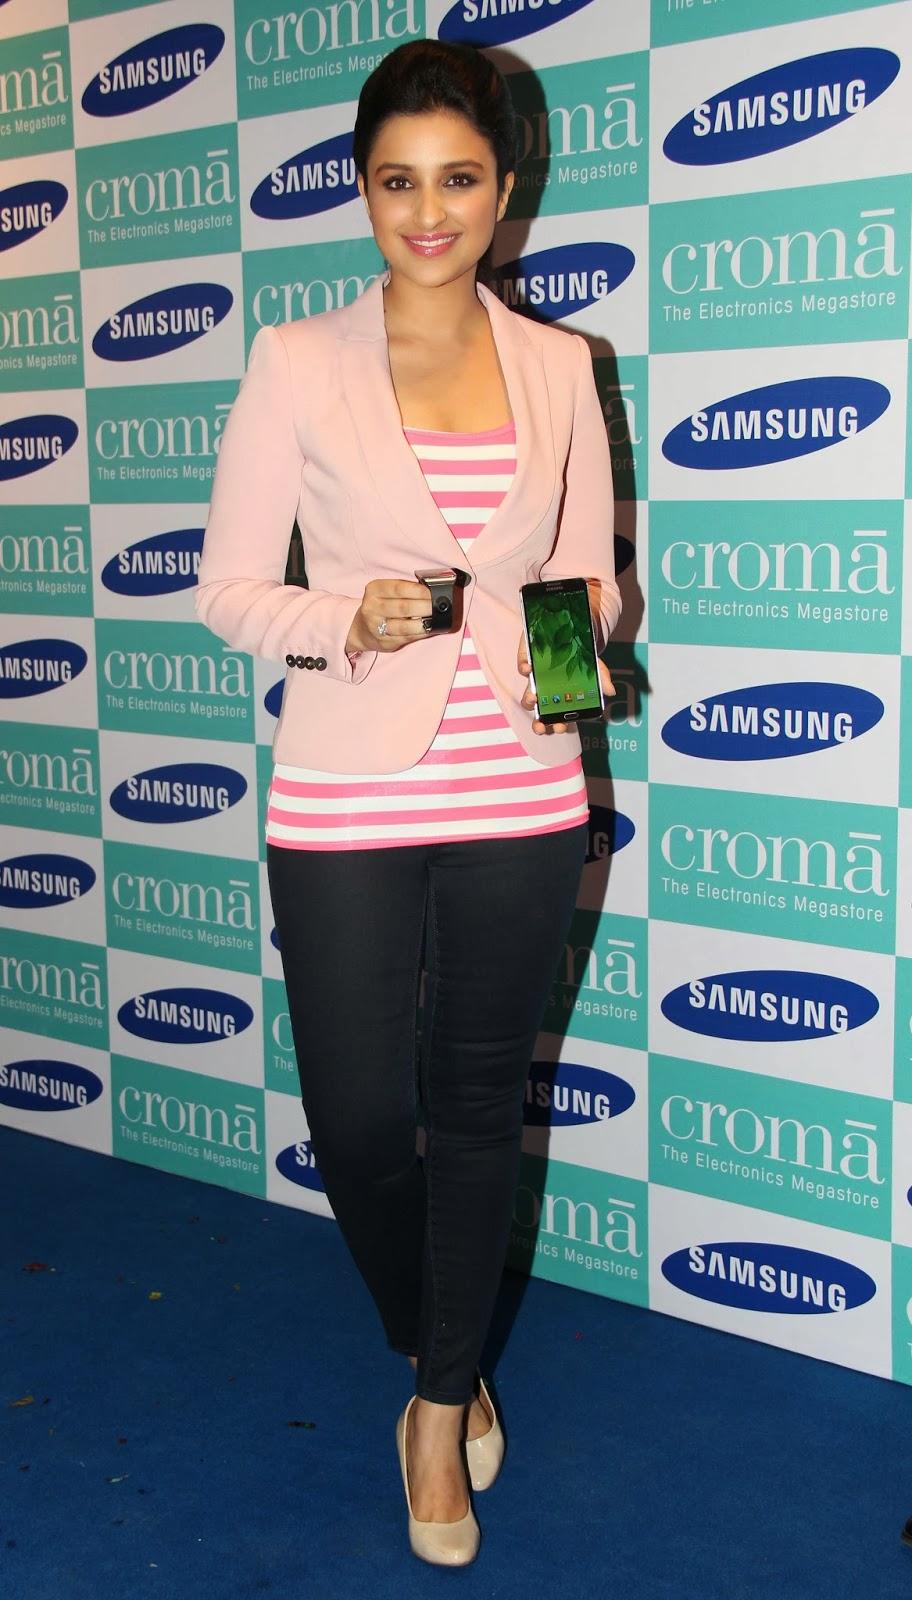 http://3.bp.blogspot.com/-flqYBw7TriM/UkRODZVOajI/AAAAAAAAcdE/rOEnQ1Ks_ss/s1600/Parineeti-Chopra-Launch-Samsung-Galaxy-Note-III-25.JPG